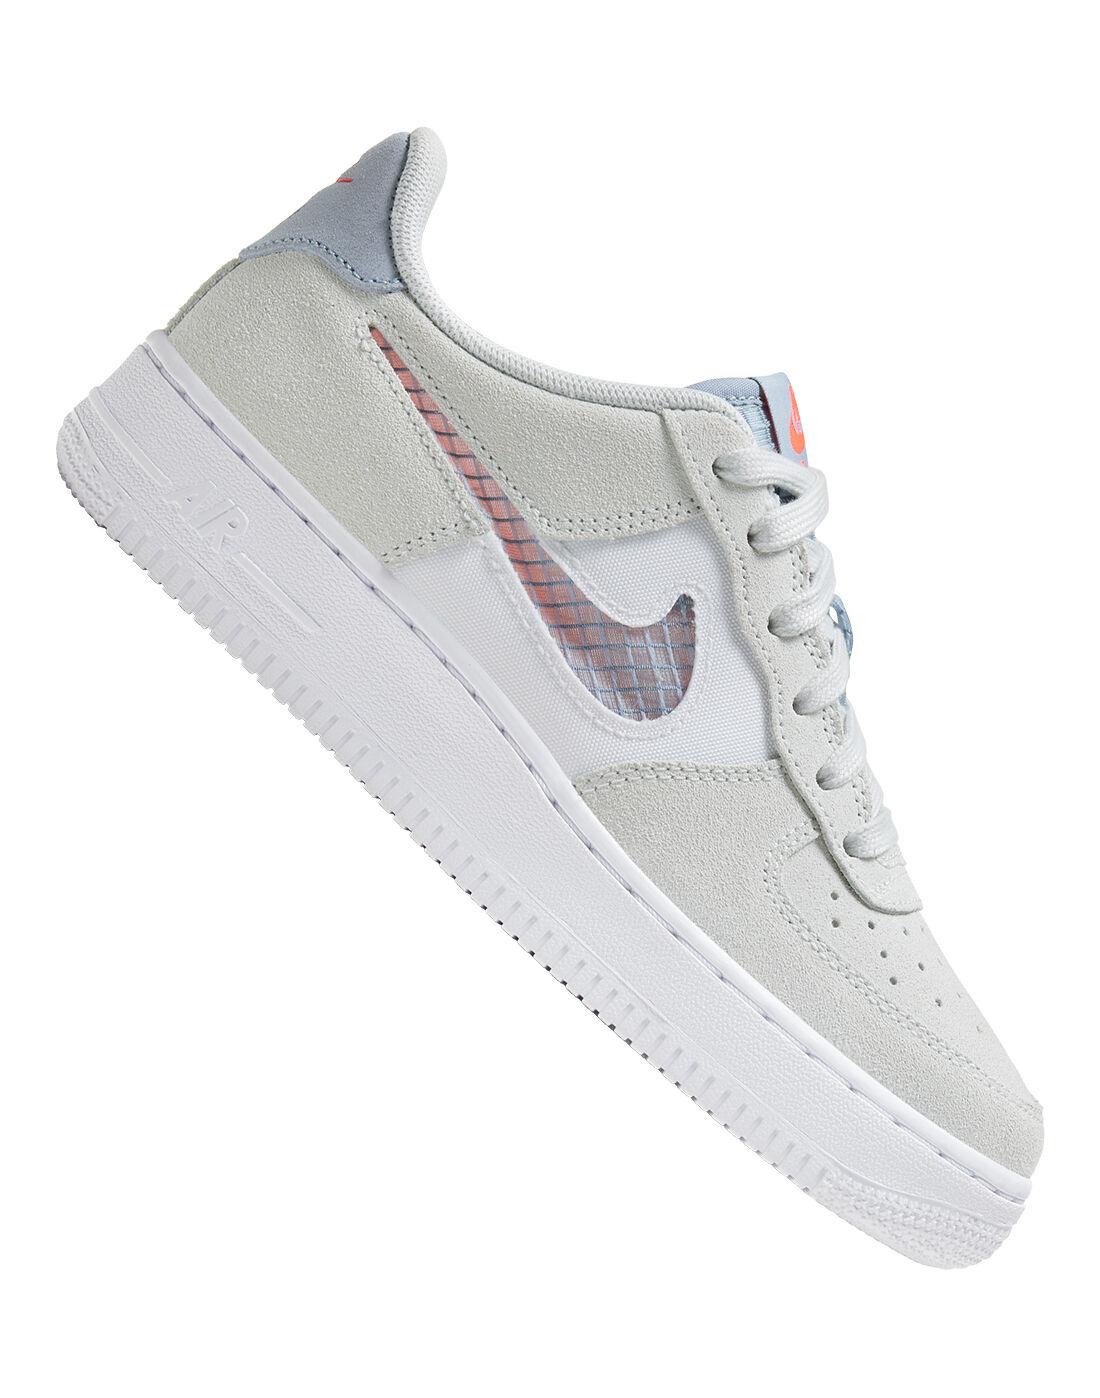 Nike Older Boys Air Force 1 LV8 Fresh